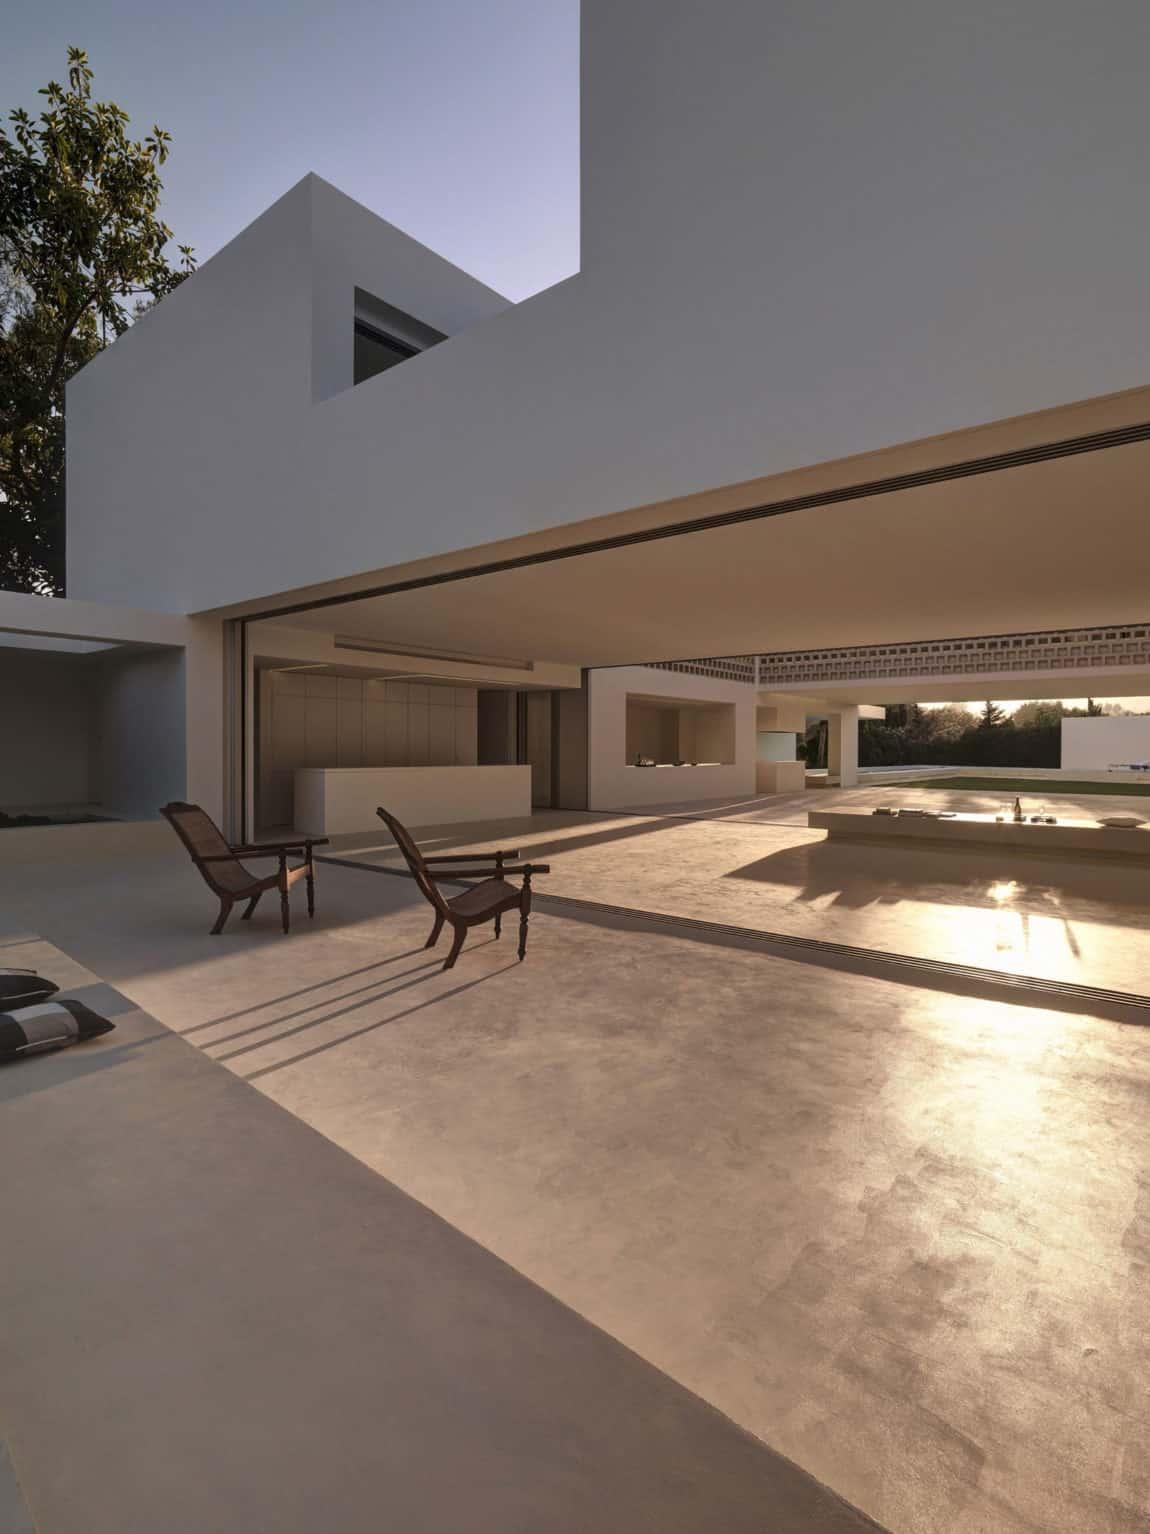 Los Limoneros by Gus Wüstemann Architects (20)